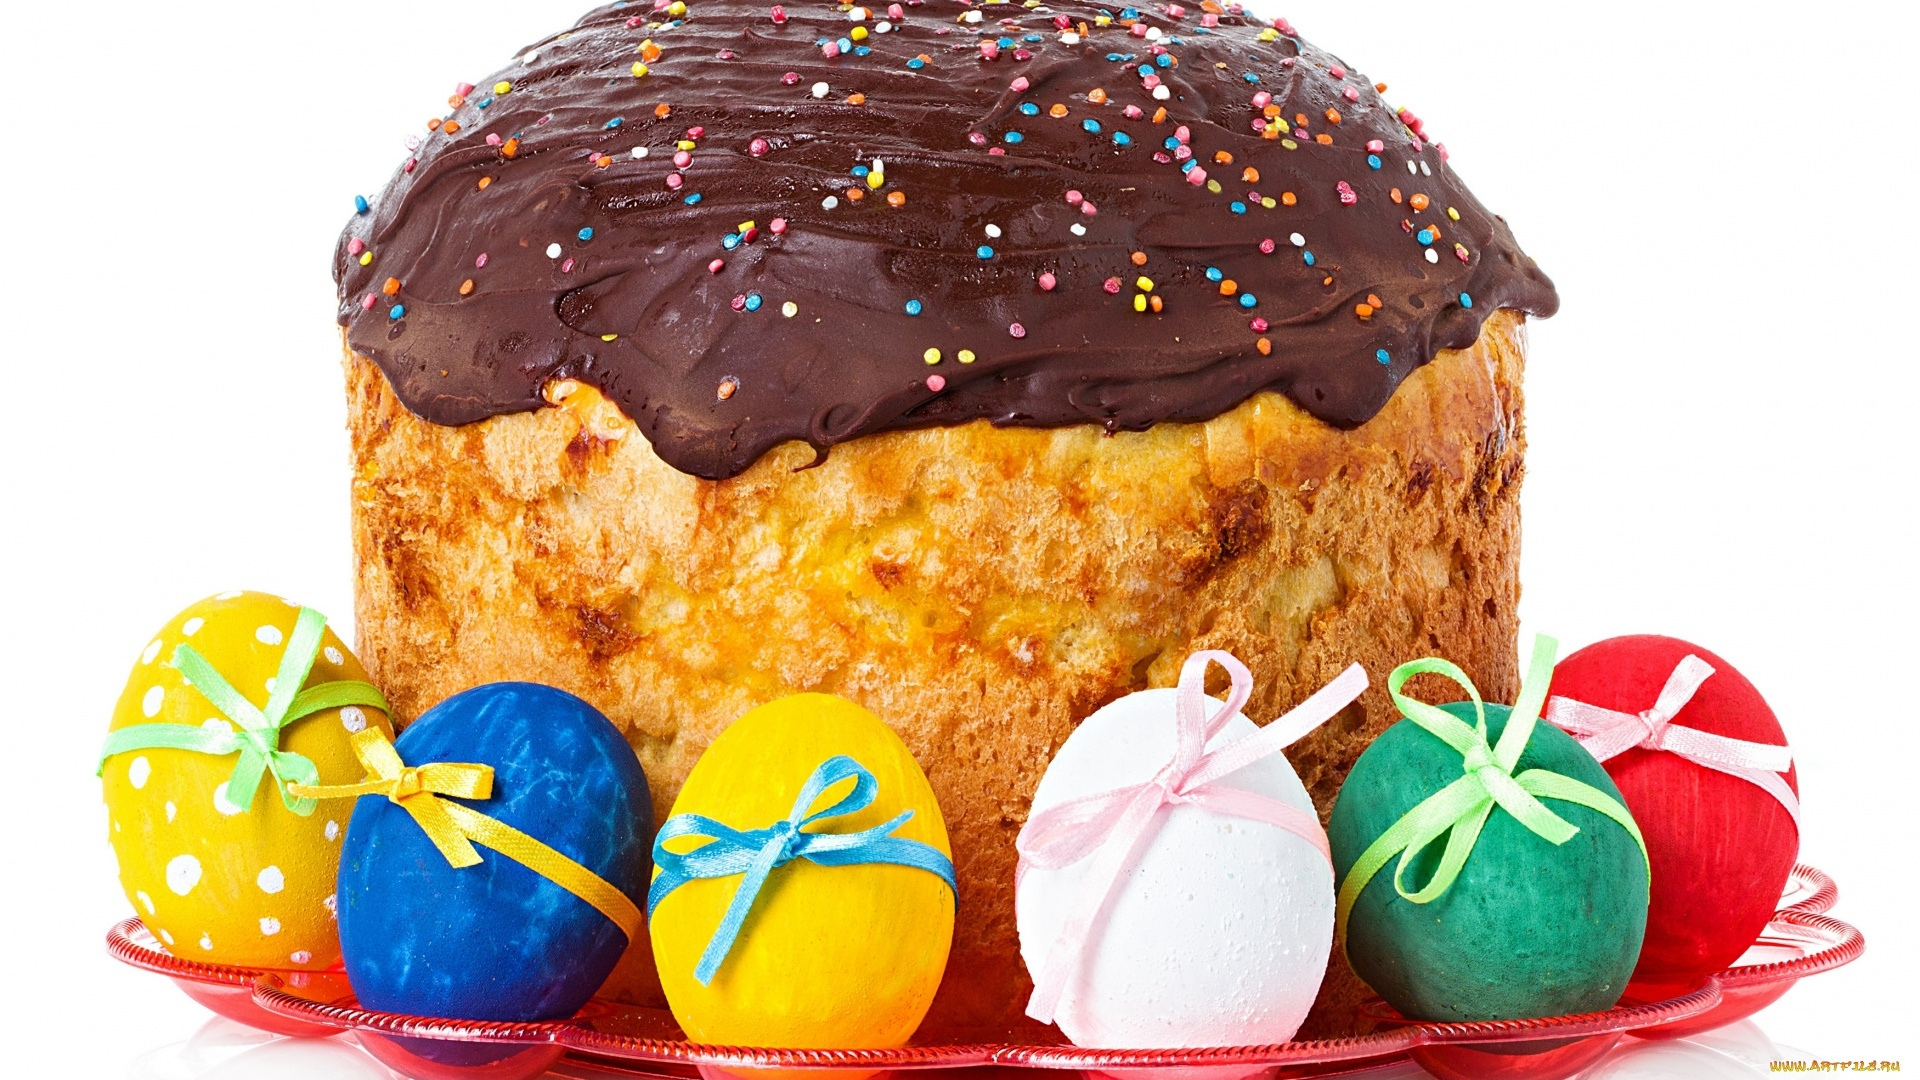 Easter Cake computer wallpaper